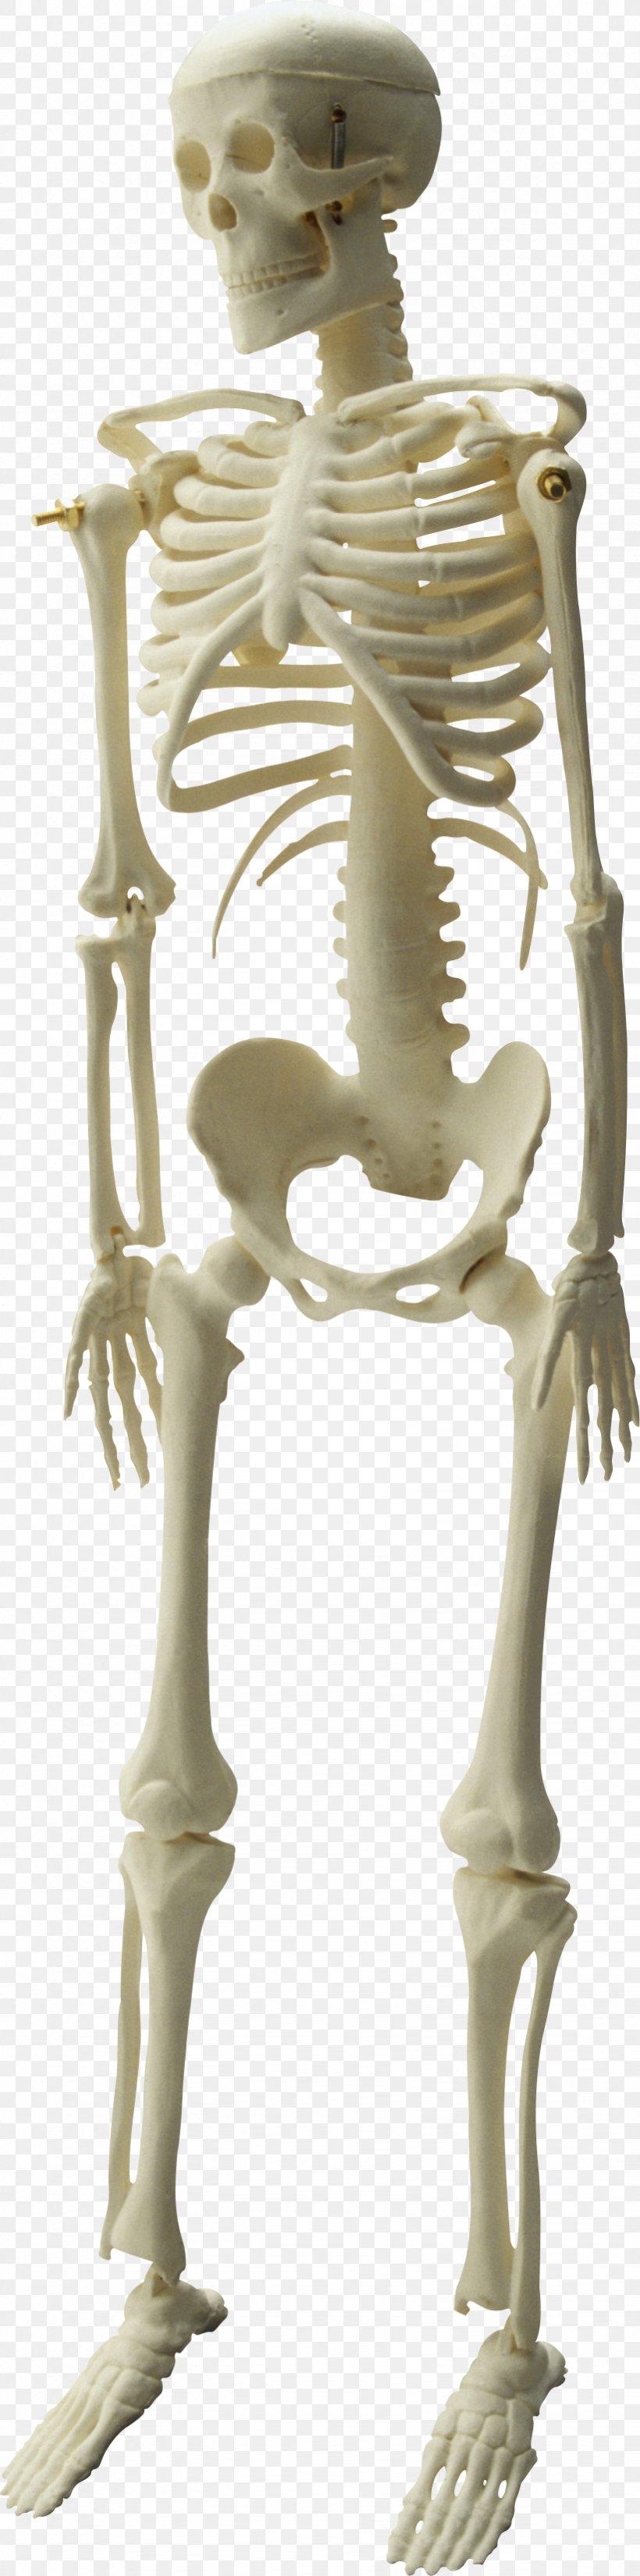 Human Skeleton Skull, PNG, 821x3305px, Skeleton, Bone, Classical Sculpture, Endoskeleton, Exoskeleton Download Free